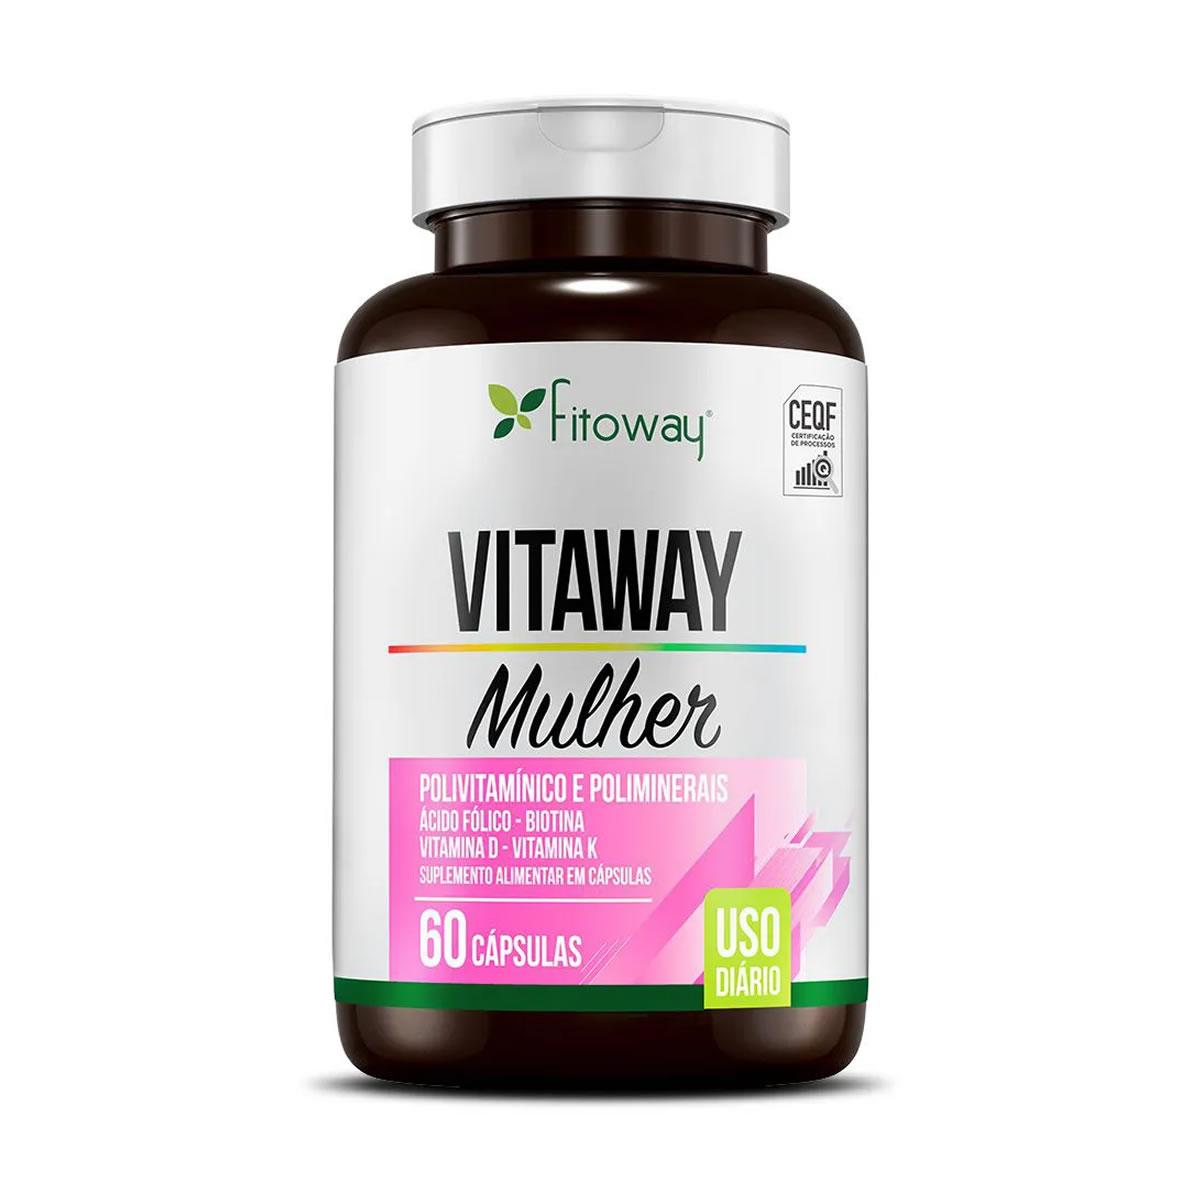 Vitaway Mulher 60 Cáps - Fitoway Clean